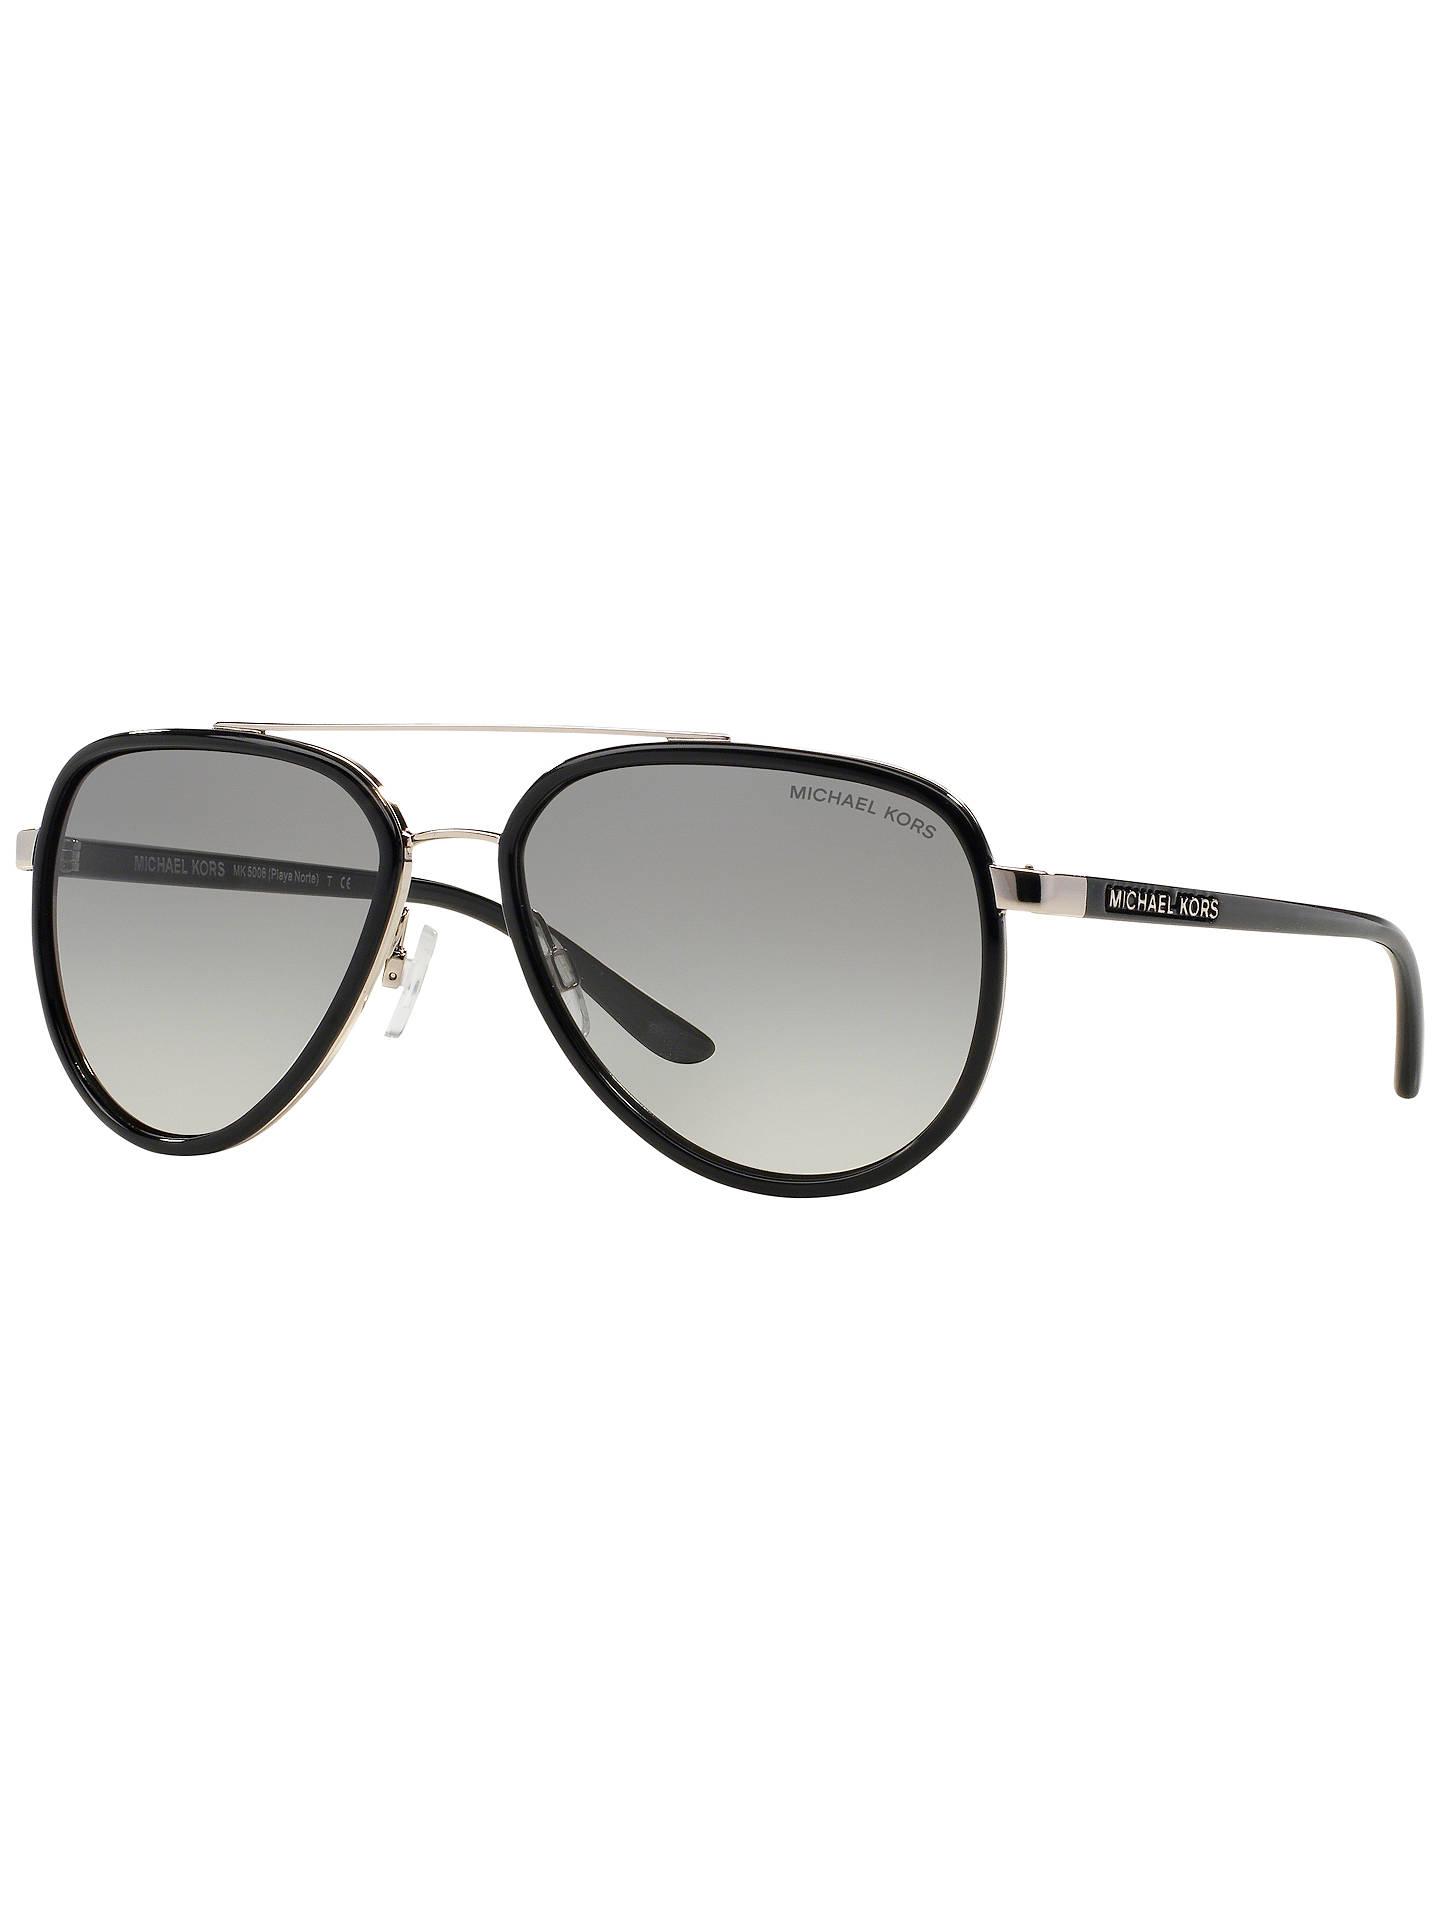 f341e1a852 Buy Michael Kors MK5006 Playa Norte Aviator Sunglasses